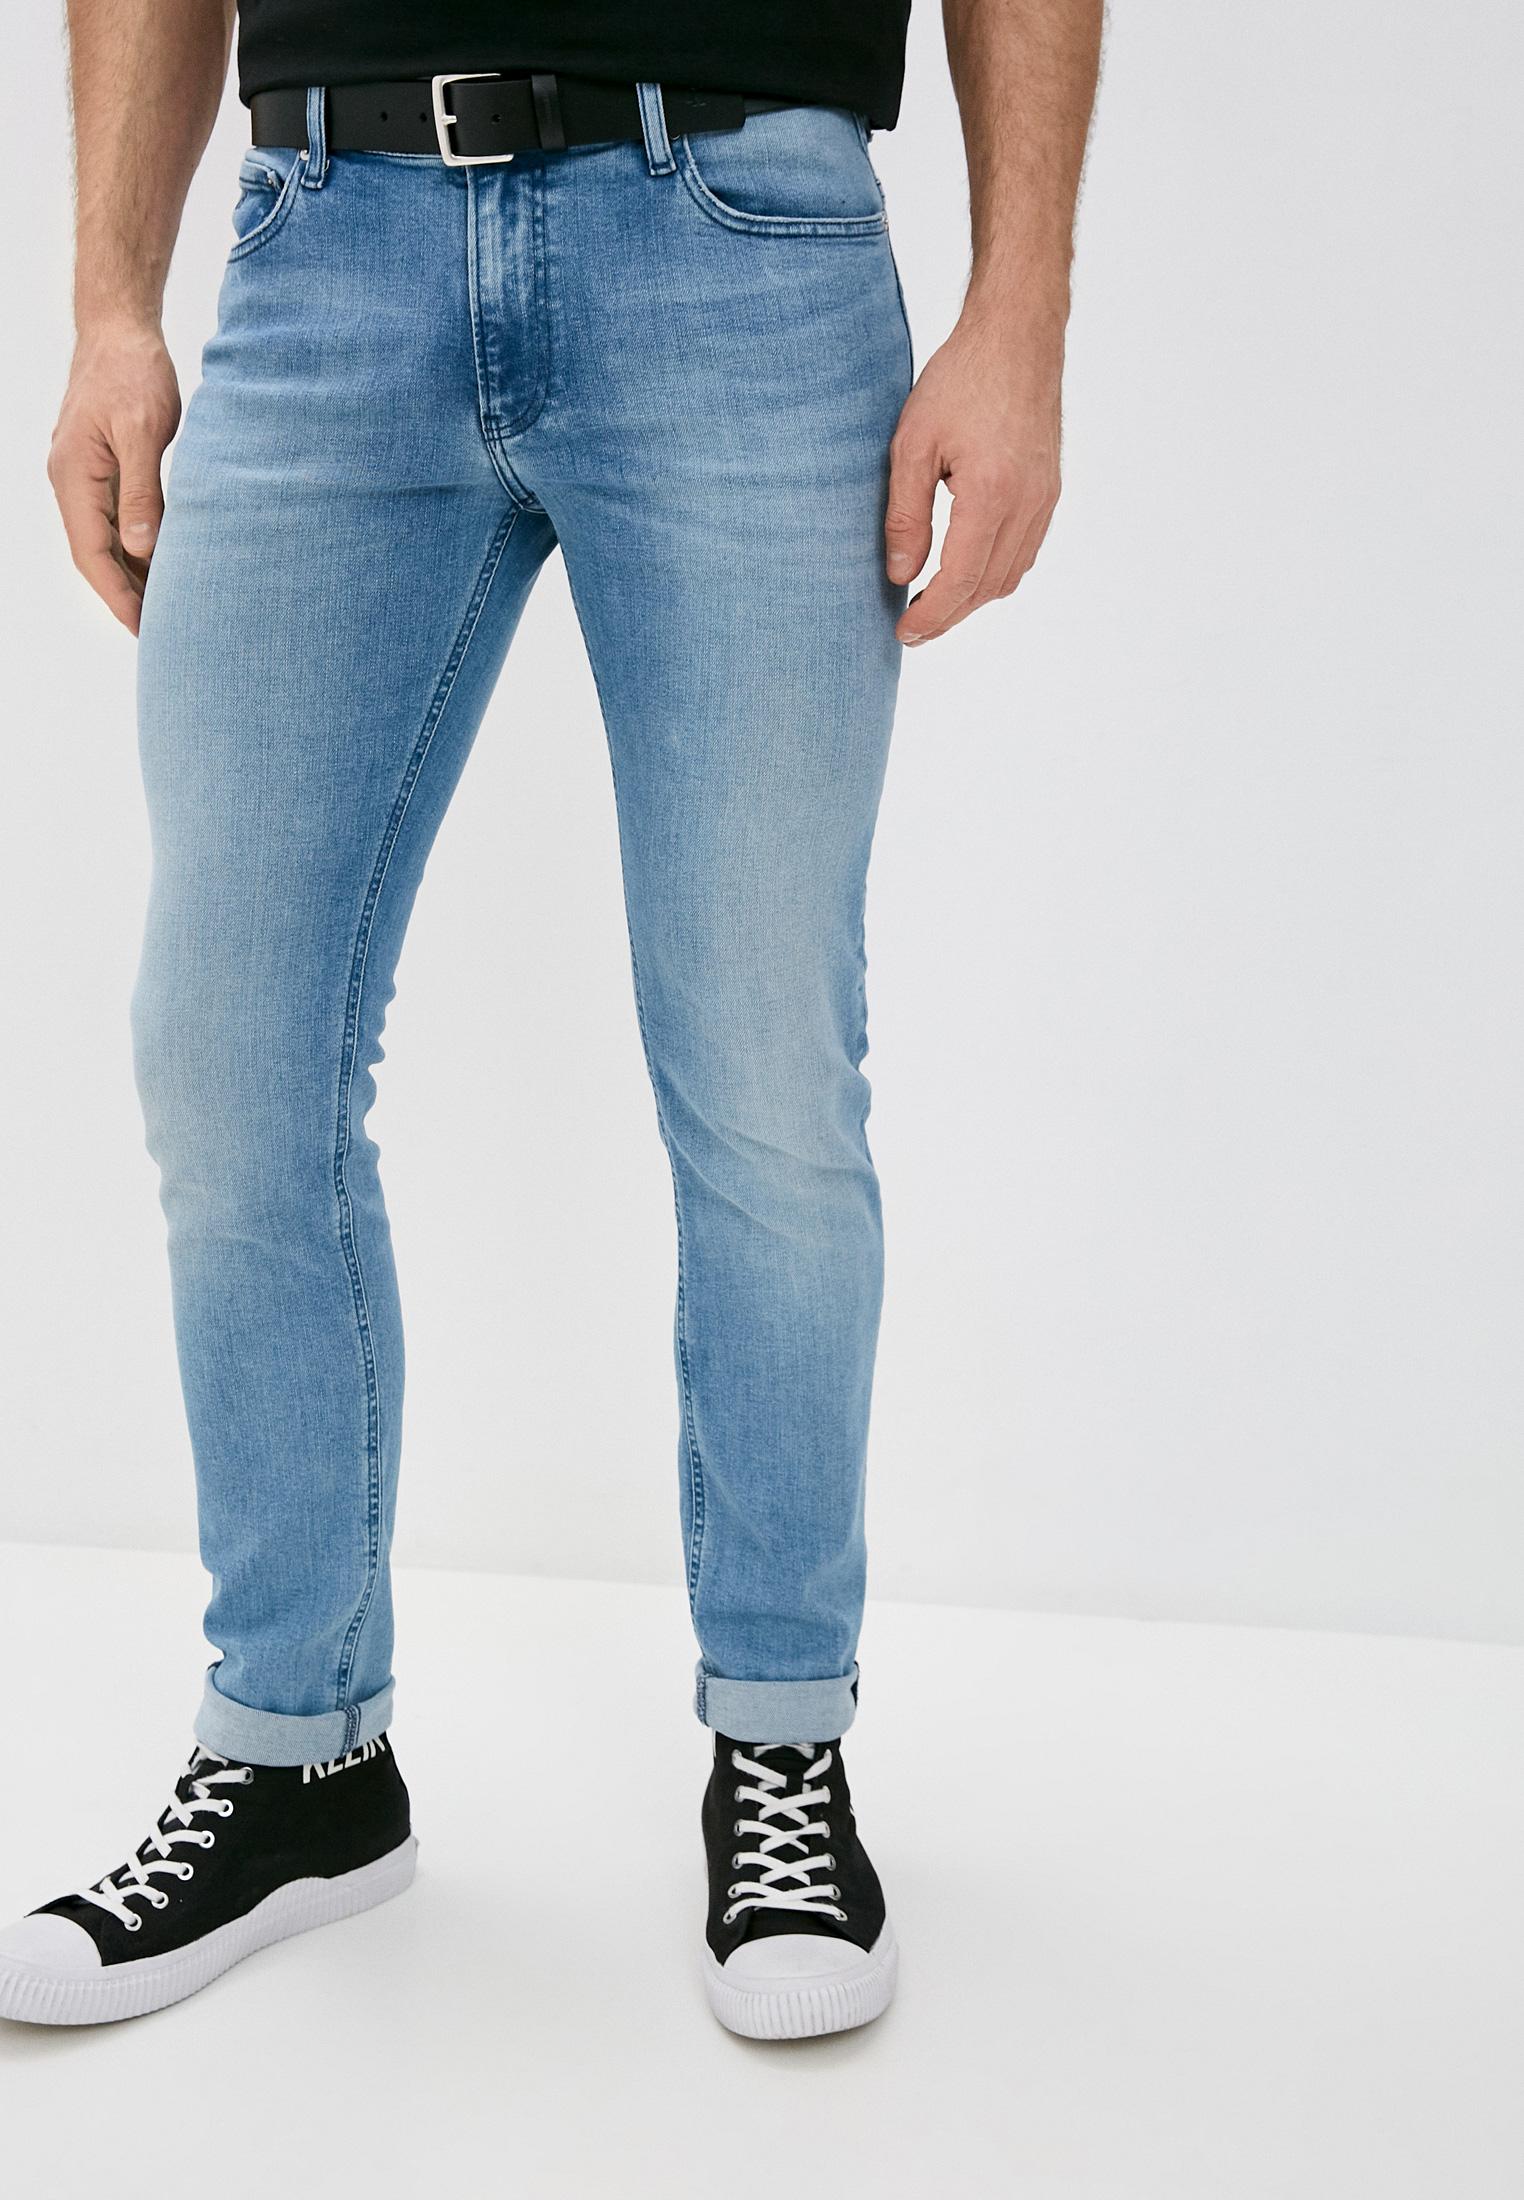 Мужские зауженные джинсы Calvin Klein (Кельвин Кляйн) K10K106559